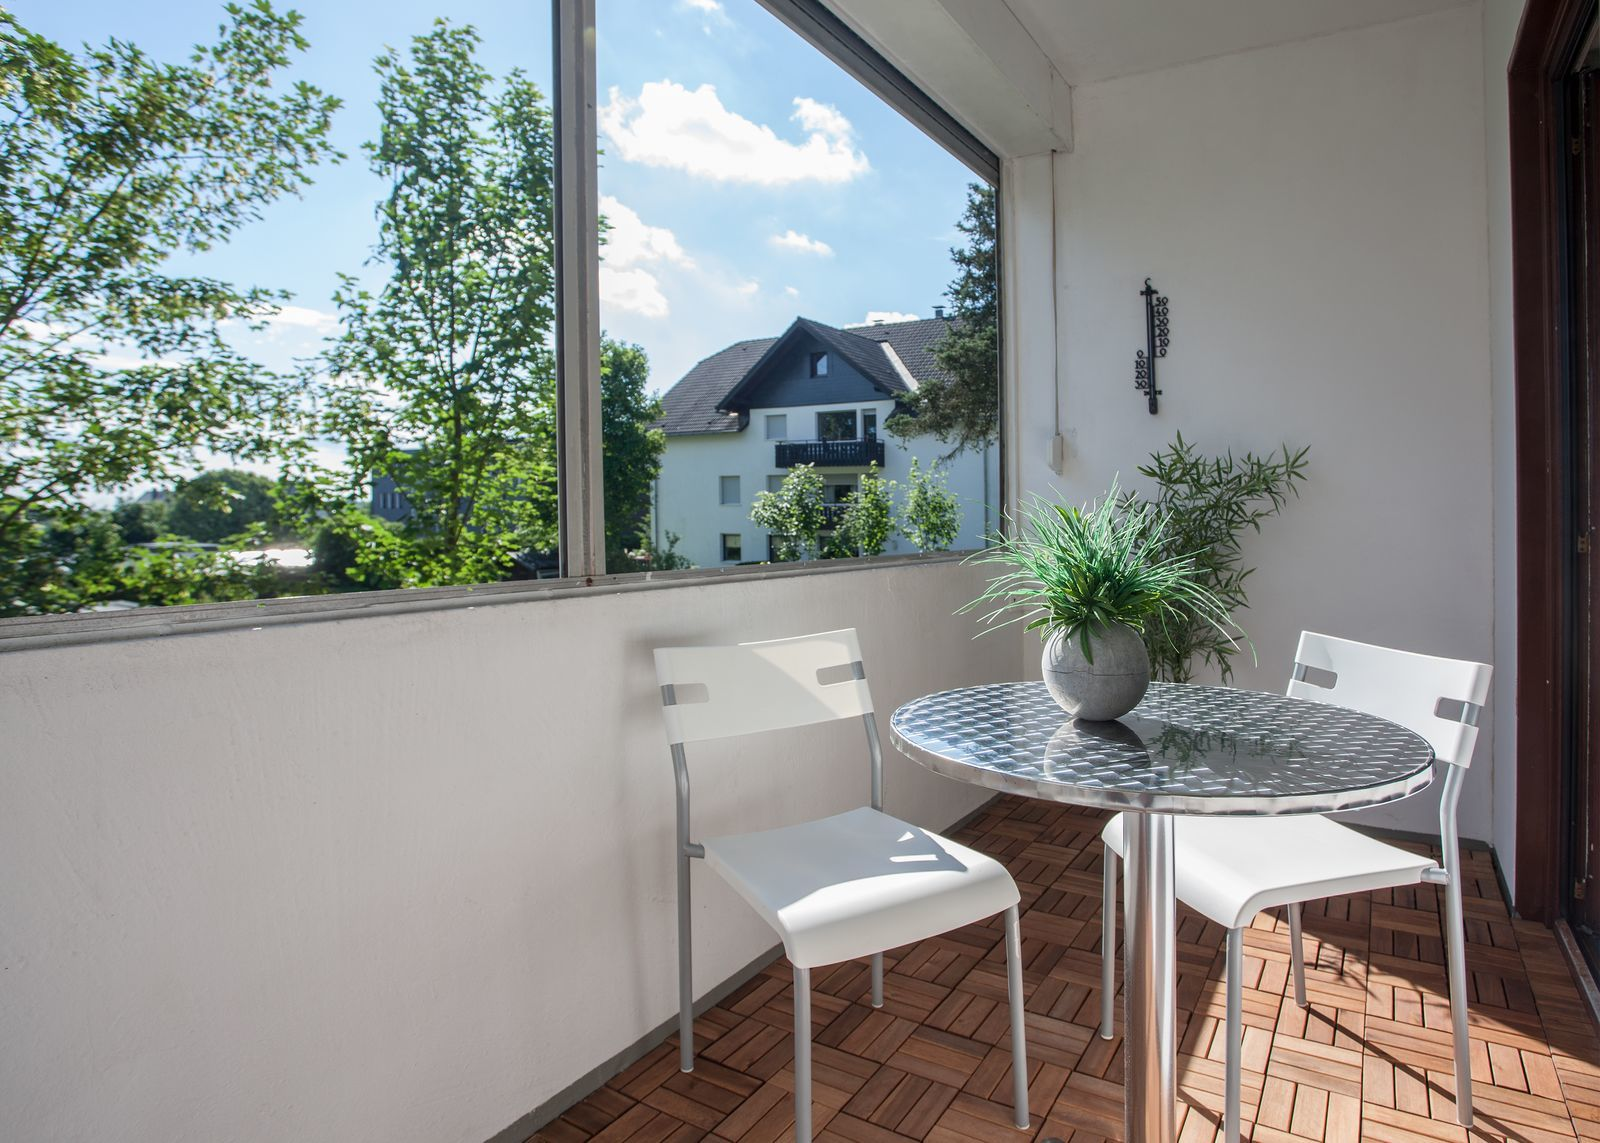 Ferienwohnung - Feldstraße 30-W | Winterberg